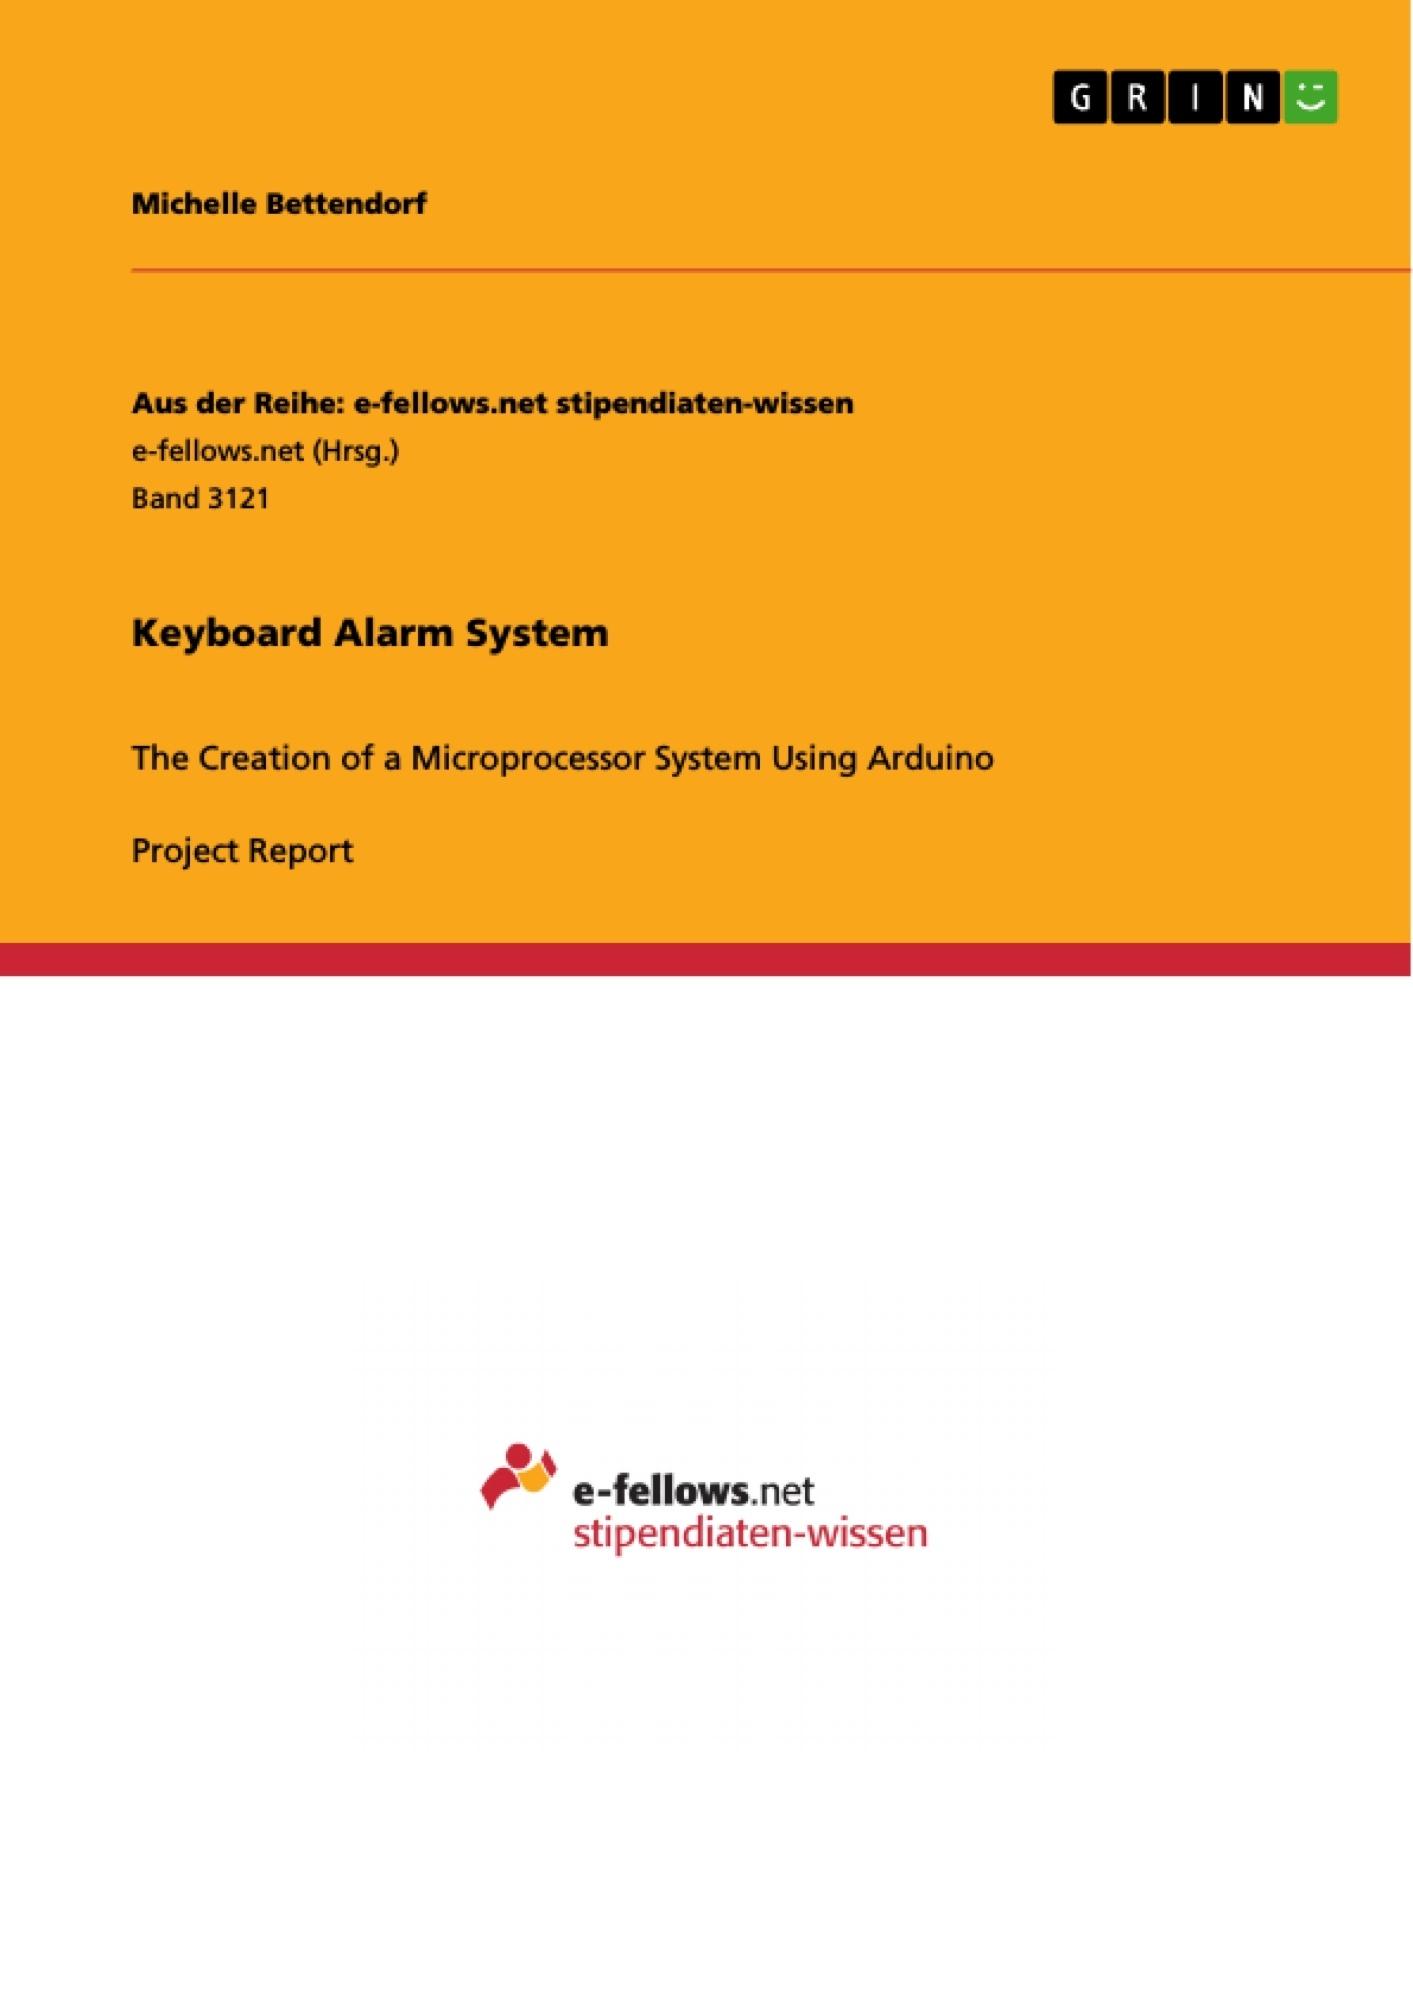 Title: Keyboard Alarm System